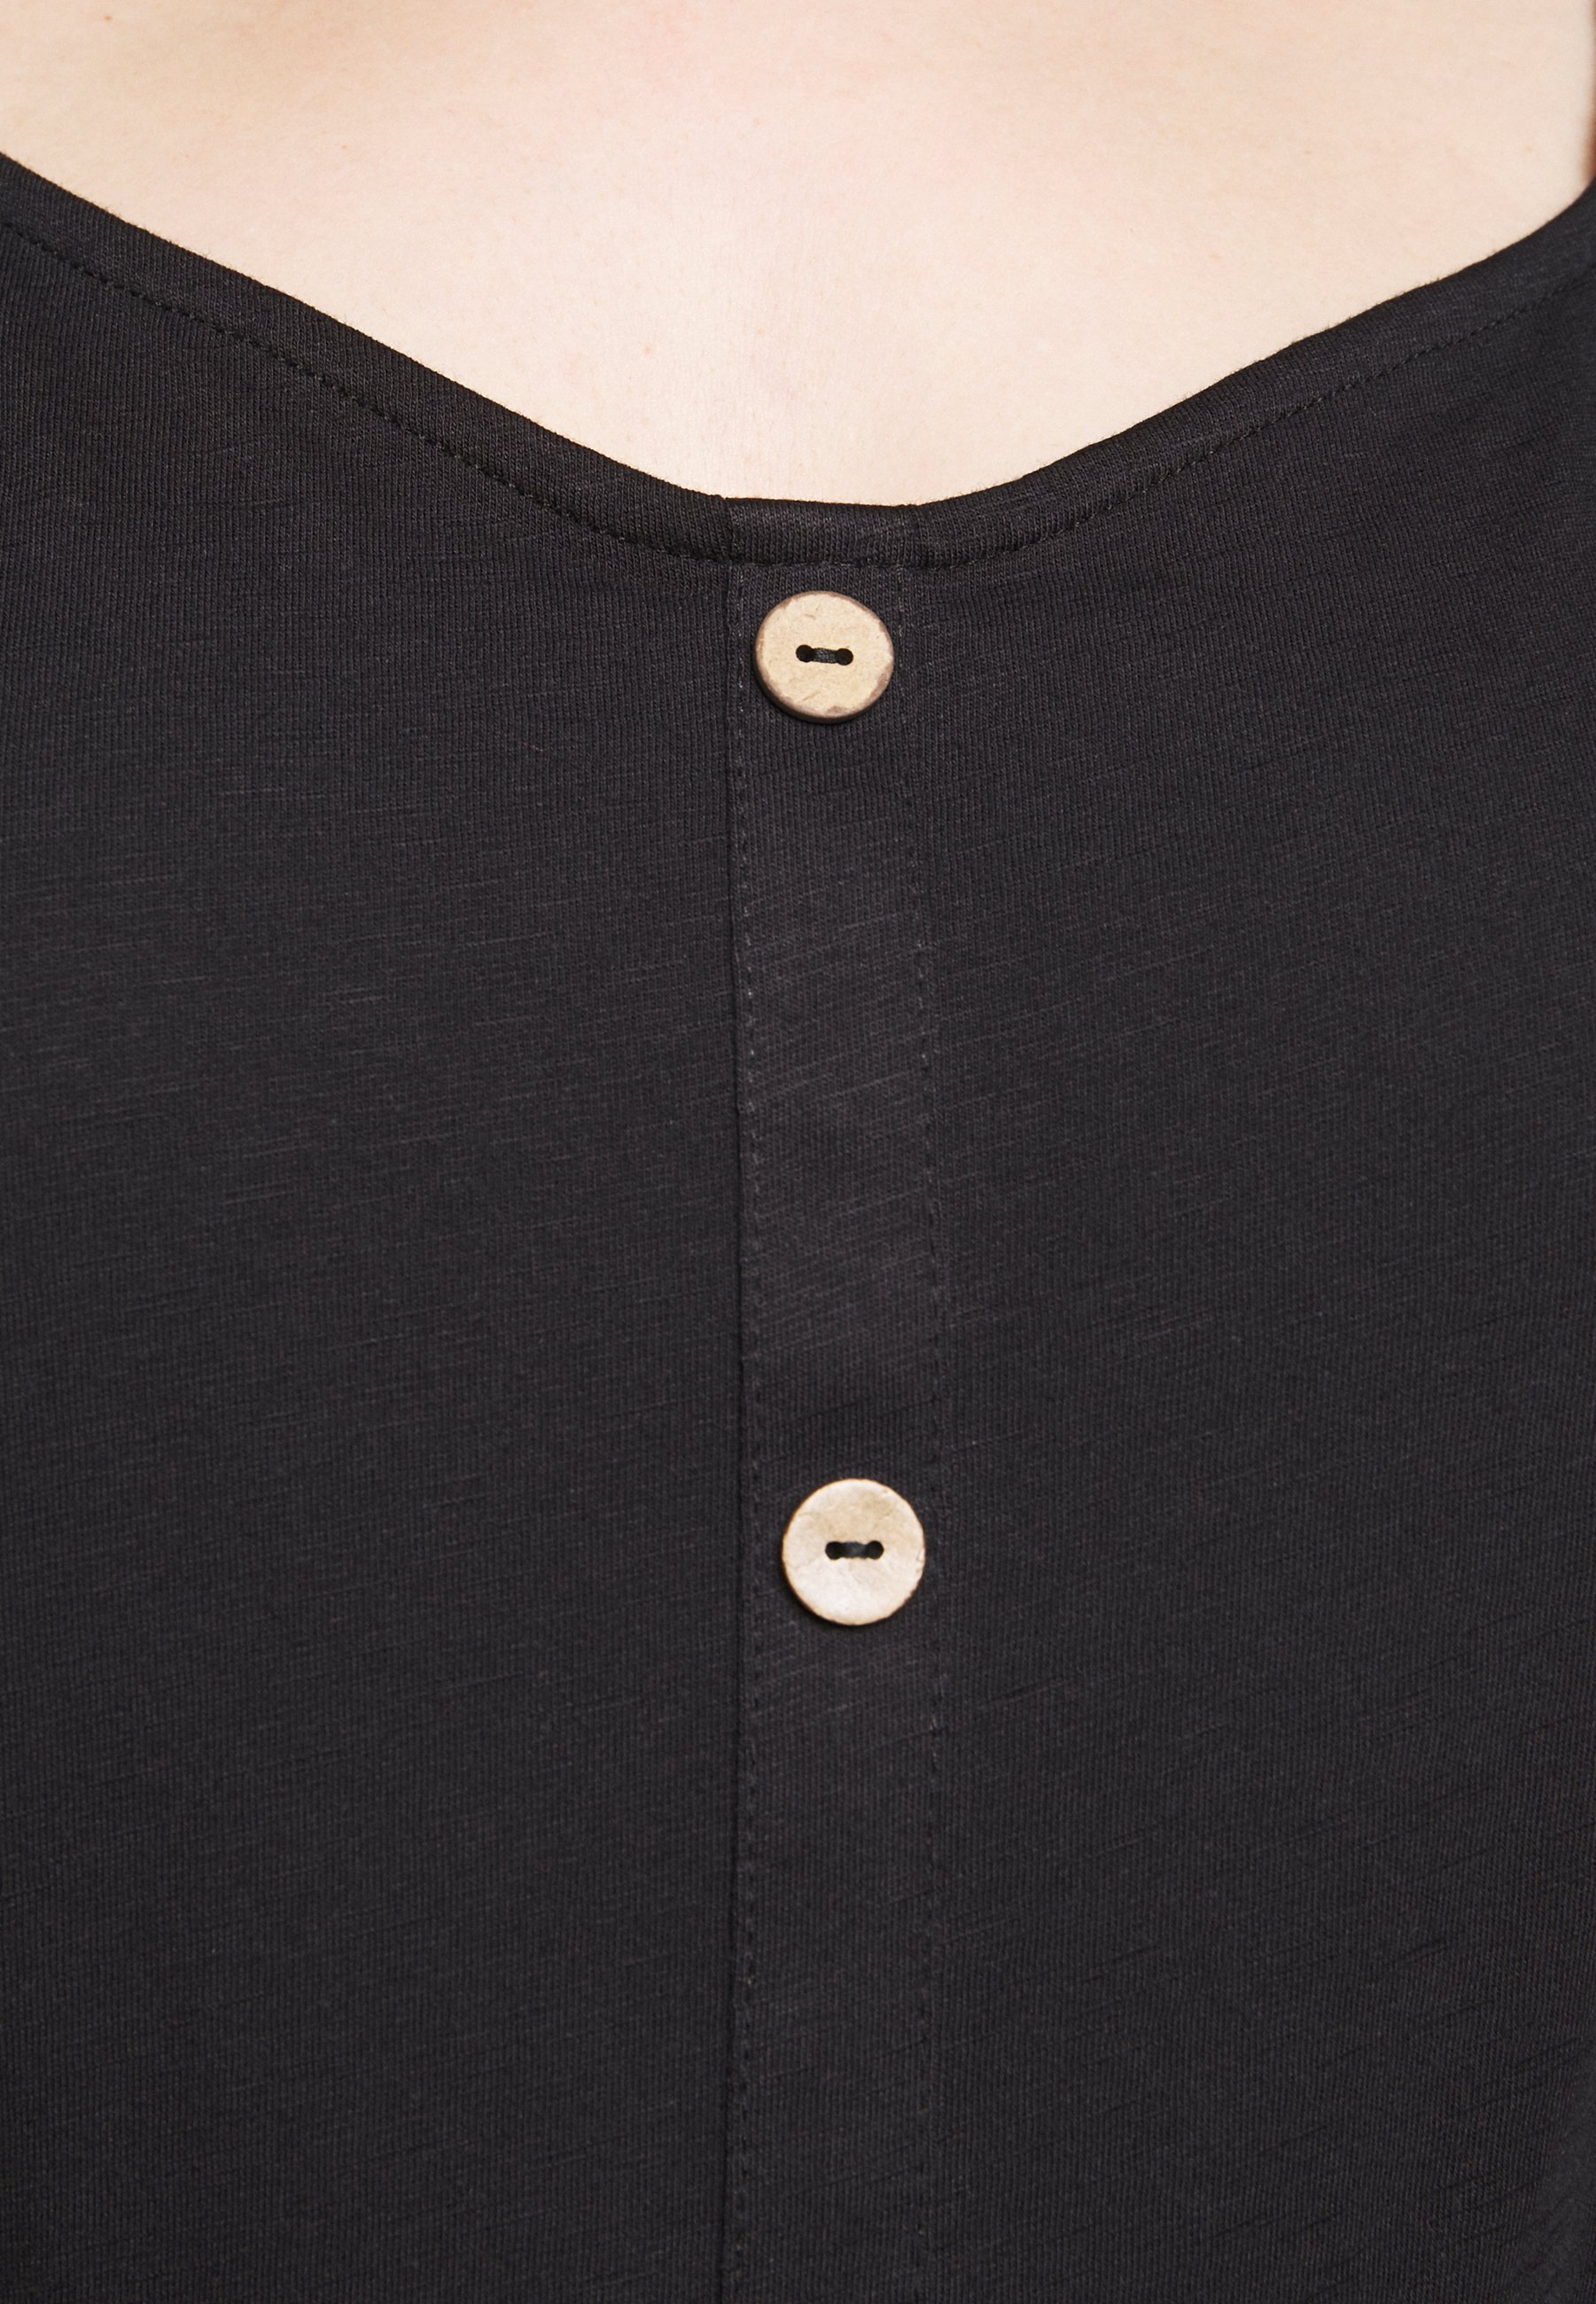 Evans Button Square Neck - Bluser Black/svart